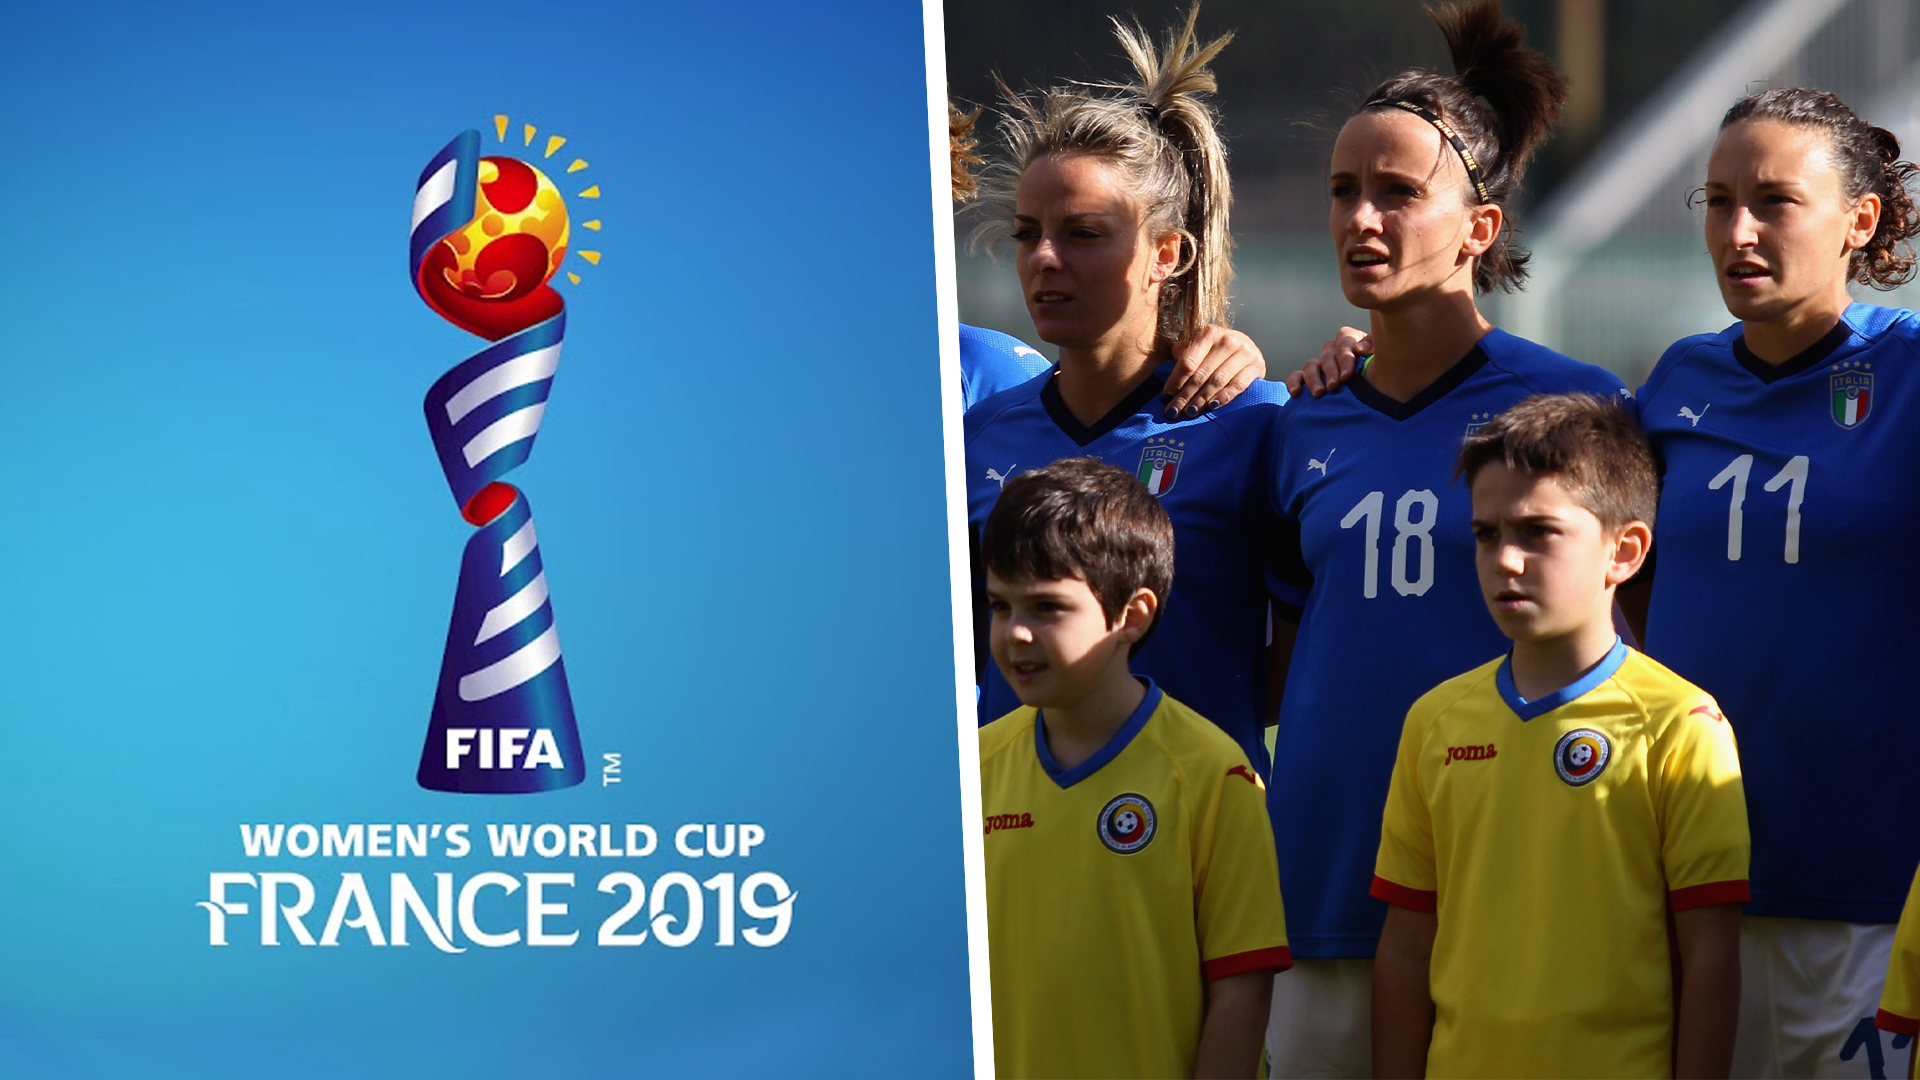 Calendario Nazionale Calcio.Mondiali Calcio Femminile 2019 Tabellone Calendario